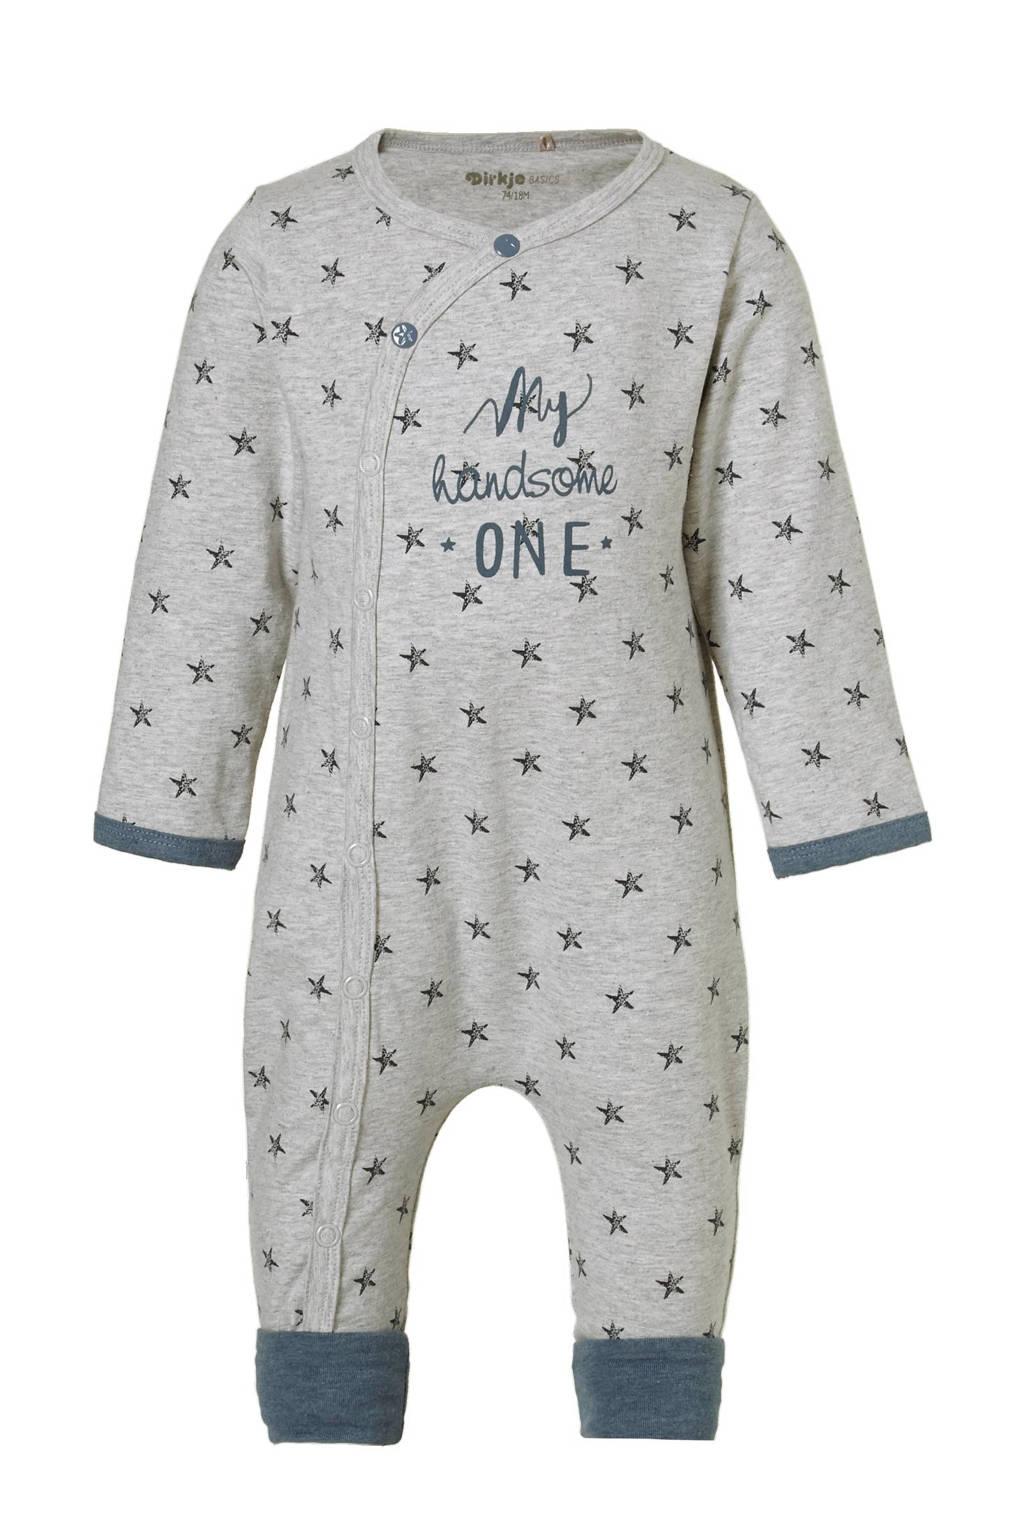 Dirkje newborn baby boxpak, grijs/blauw melange